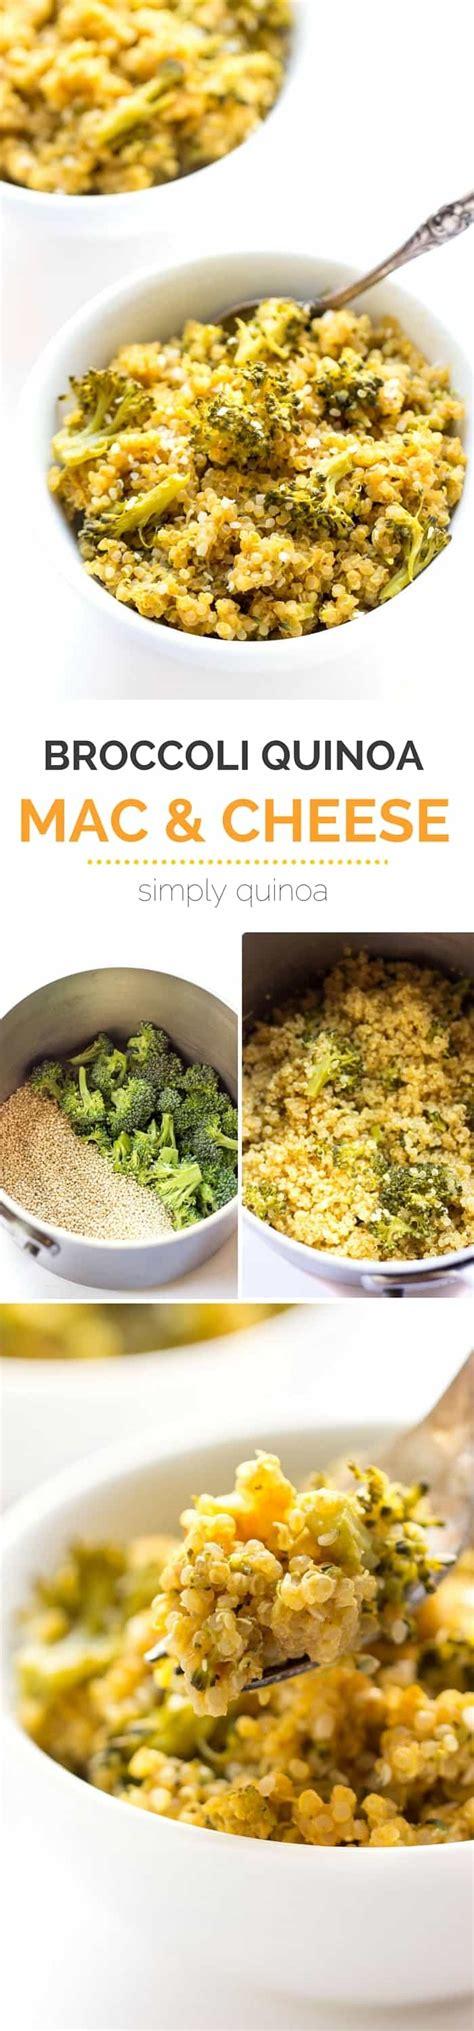 Osk Quinoa Blend Kokumotsu 300g broccoli quinoa mac and cheese recipe simply quinoa